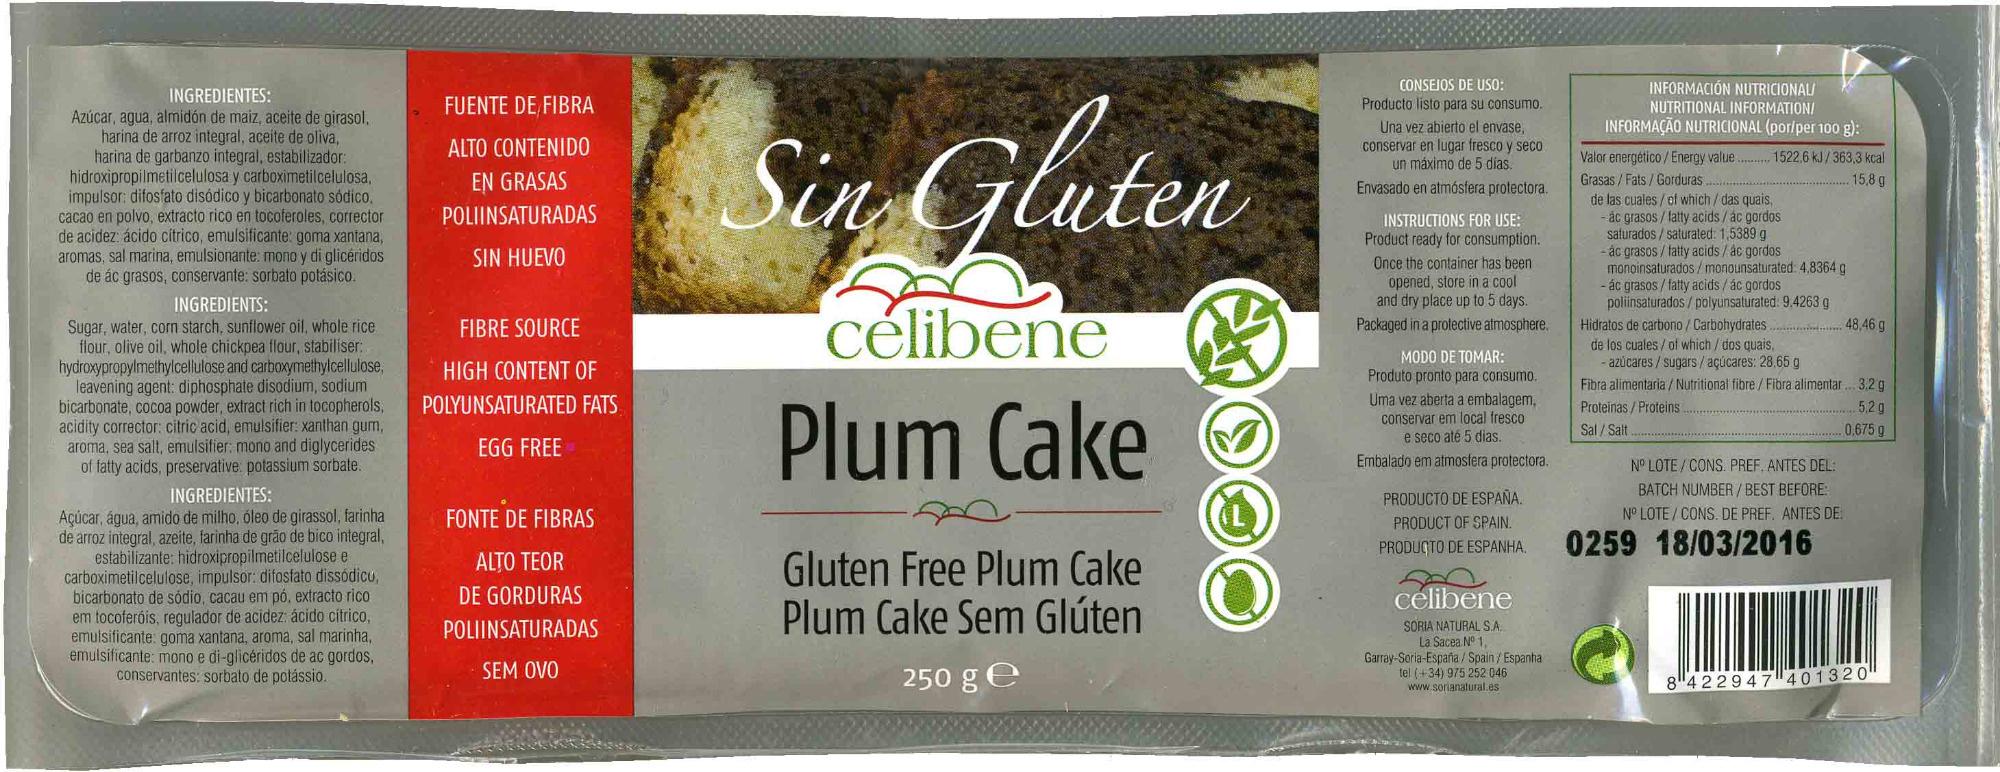 Plum cake sin gluten - Product